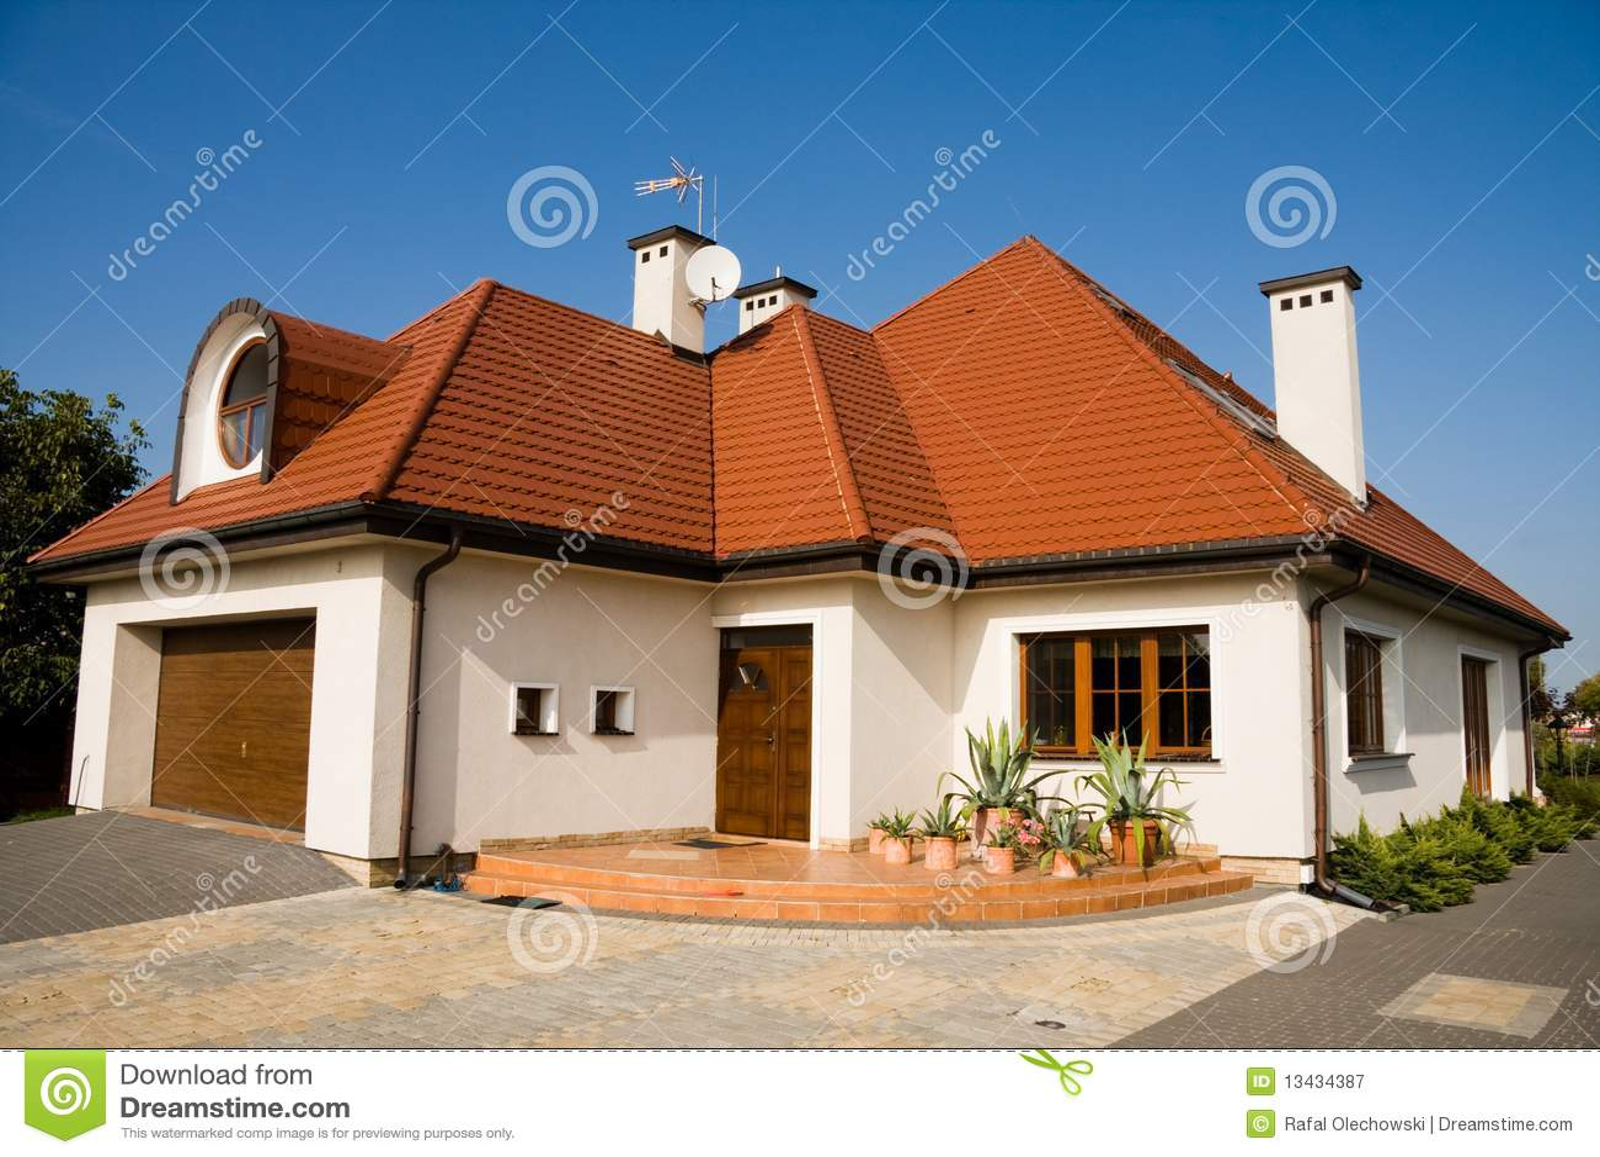 Single family medium house stock image image of living for Medium houses